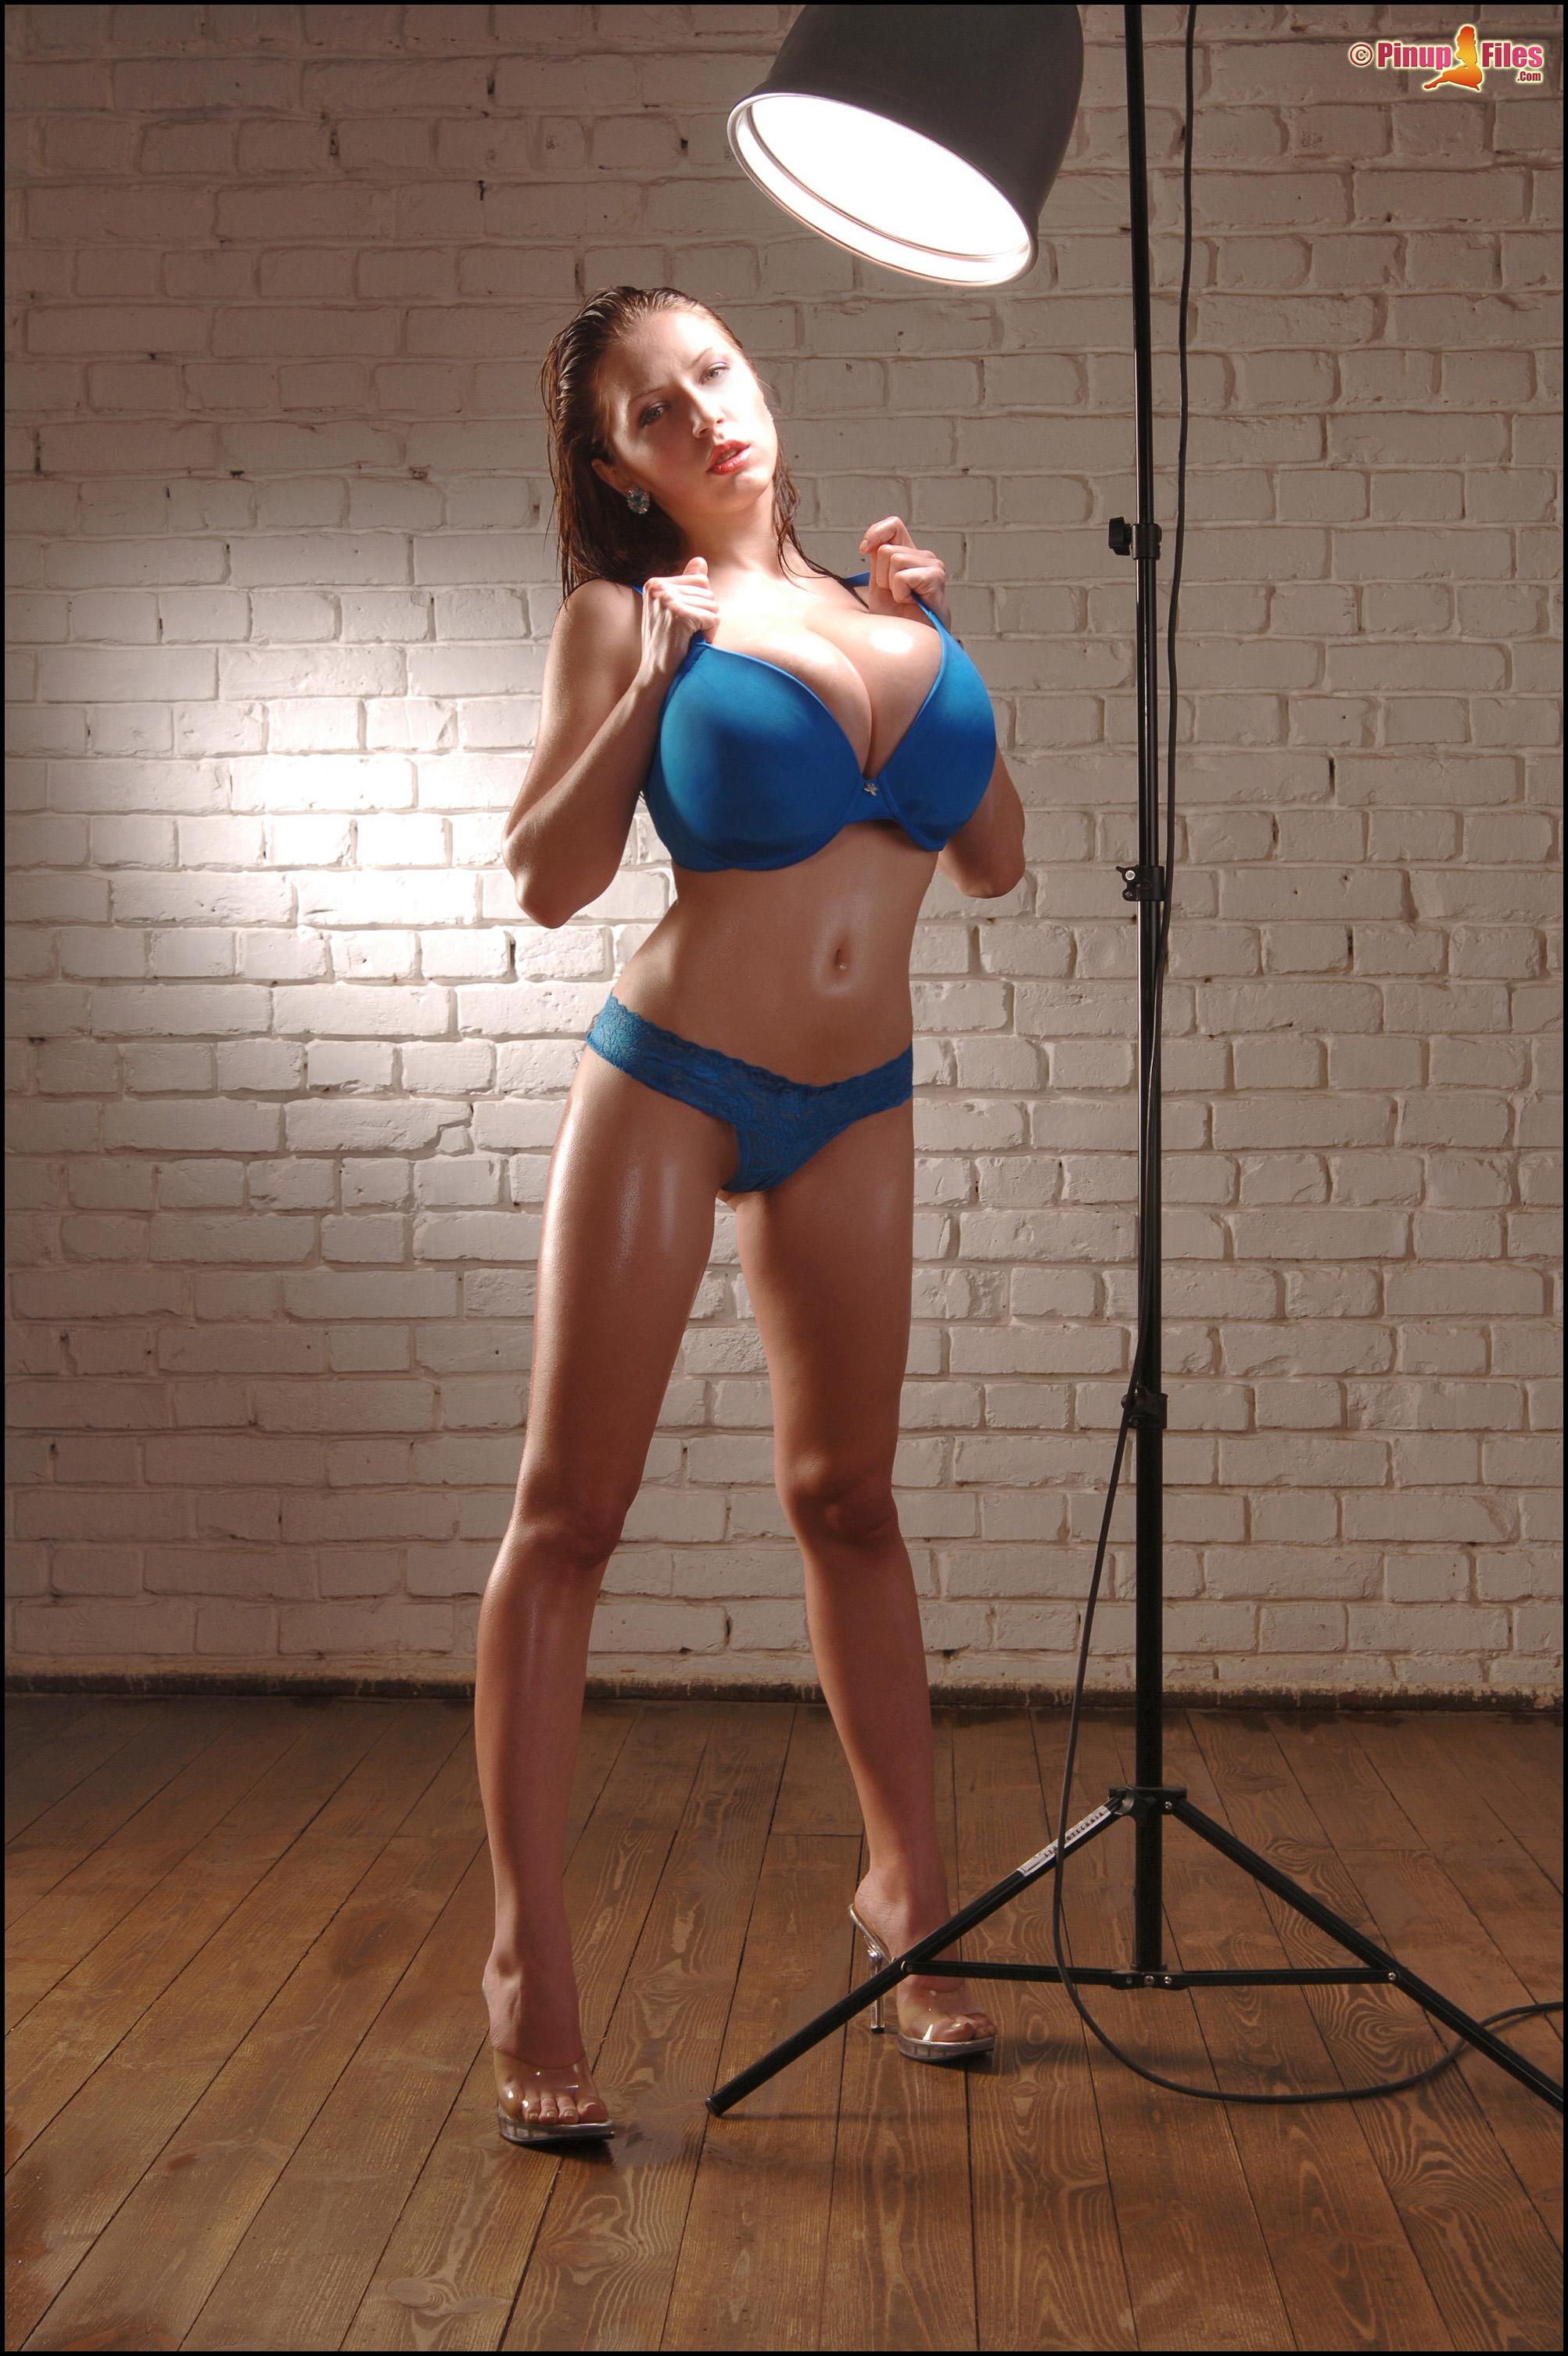 http://promo.pinupfiles.com/FHG/anyazenkova-vol10-set01/03.jpg